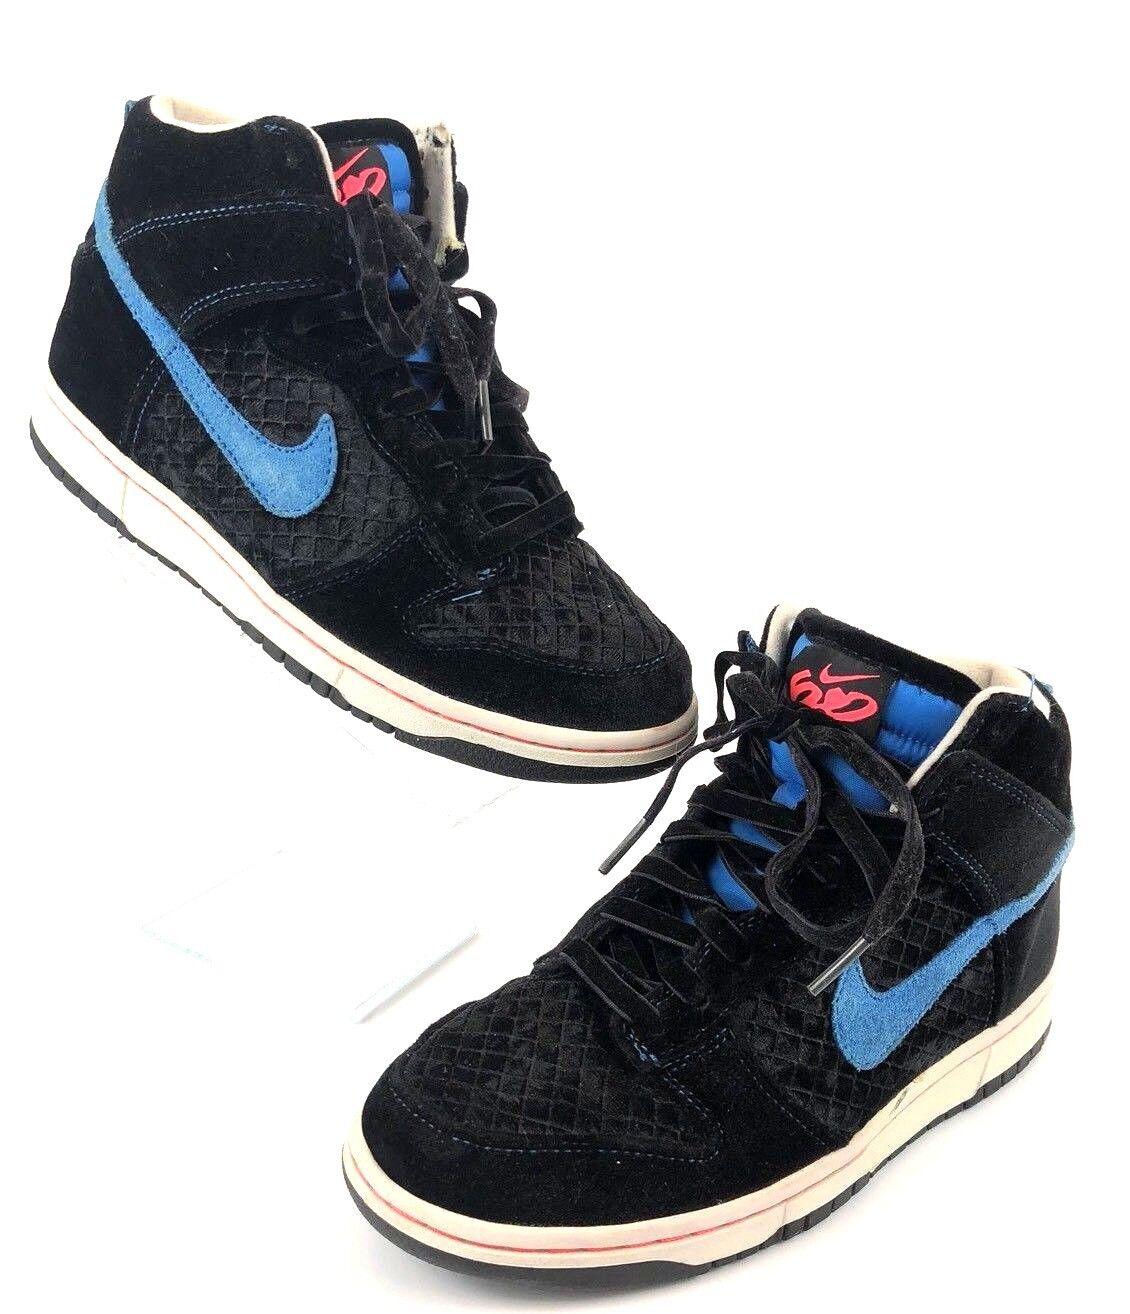 Nike 6.0 Dunk High Womens Sz 8 Black Blue 342257-002